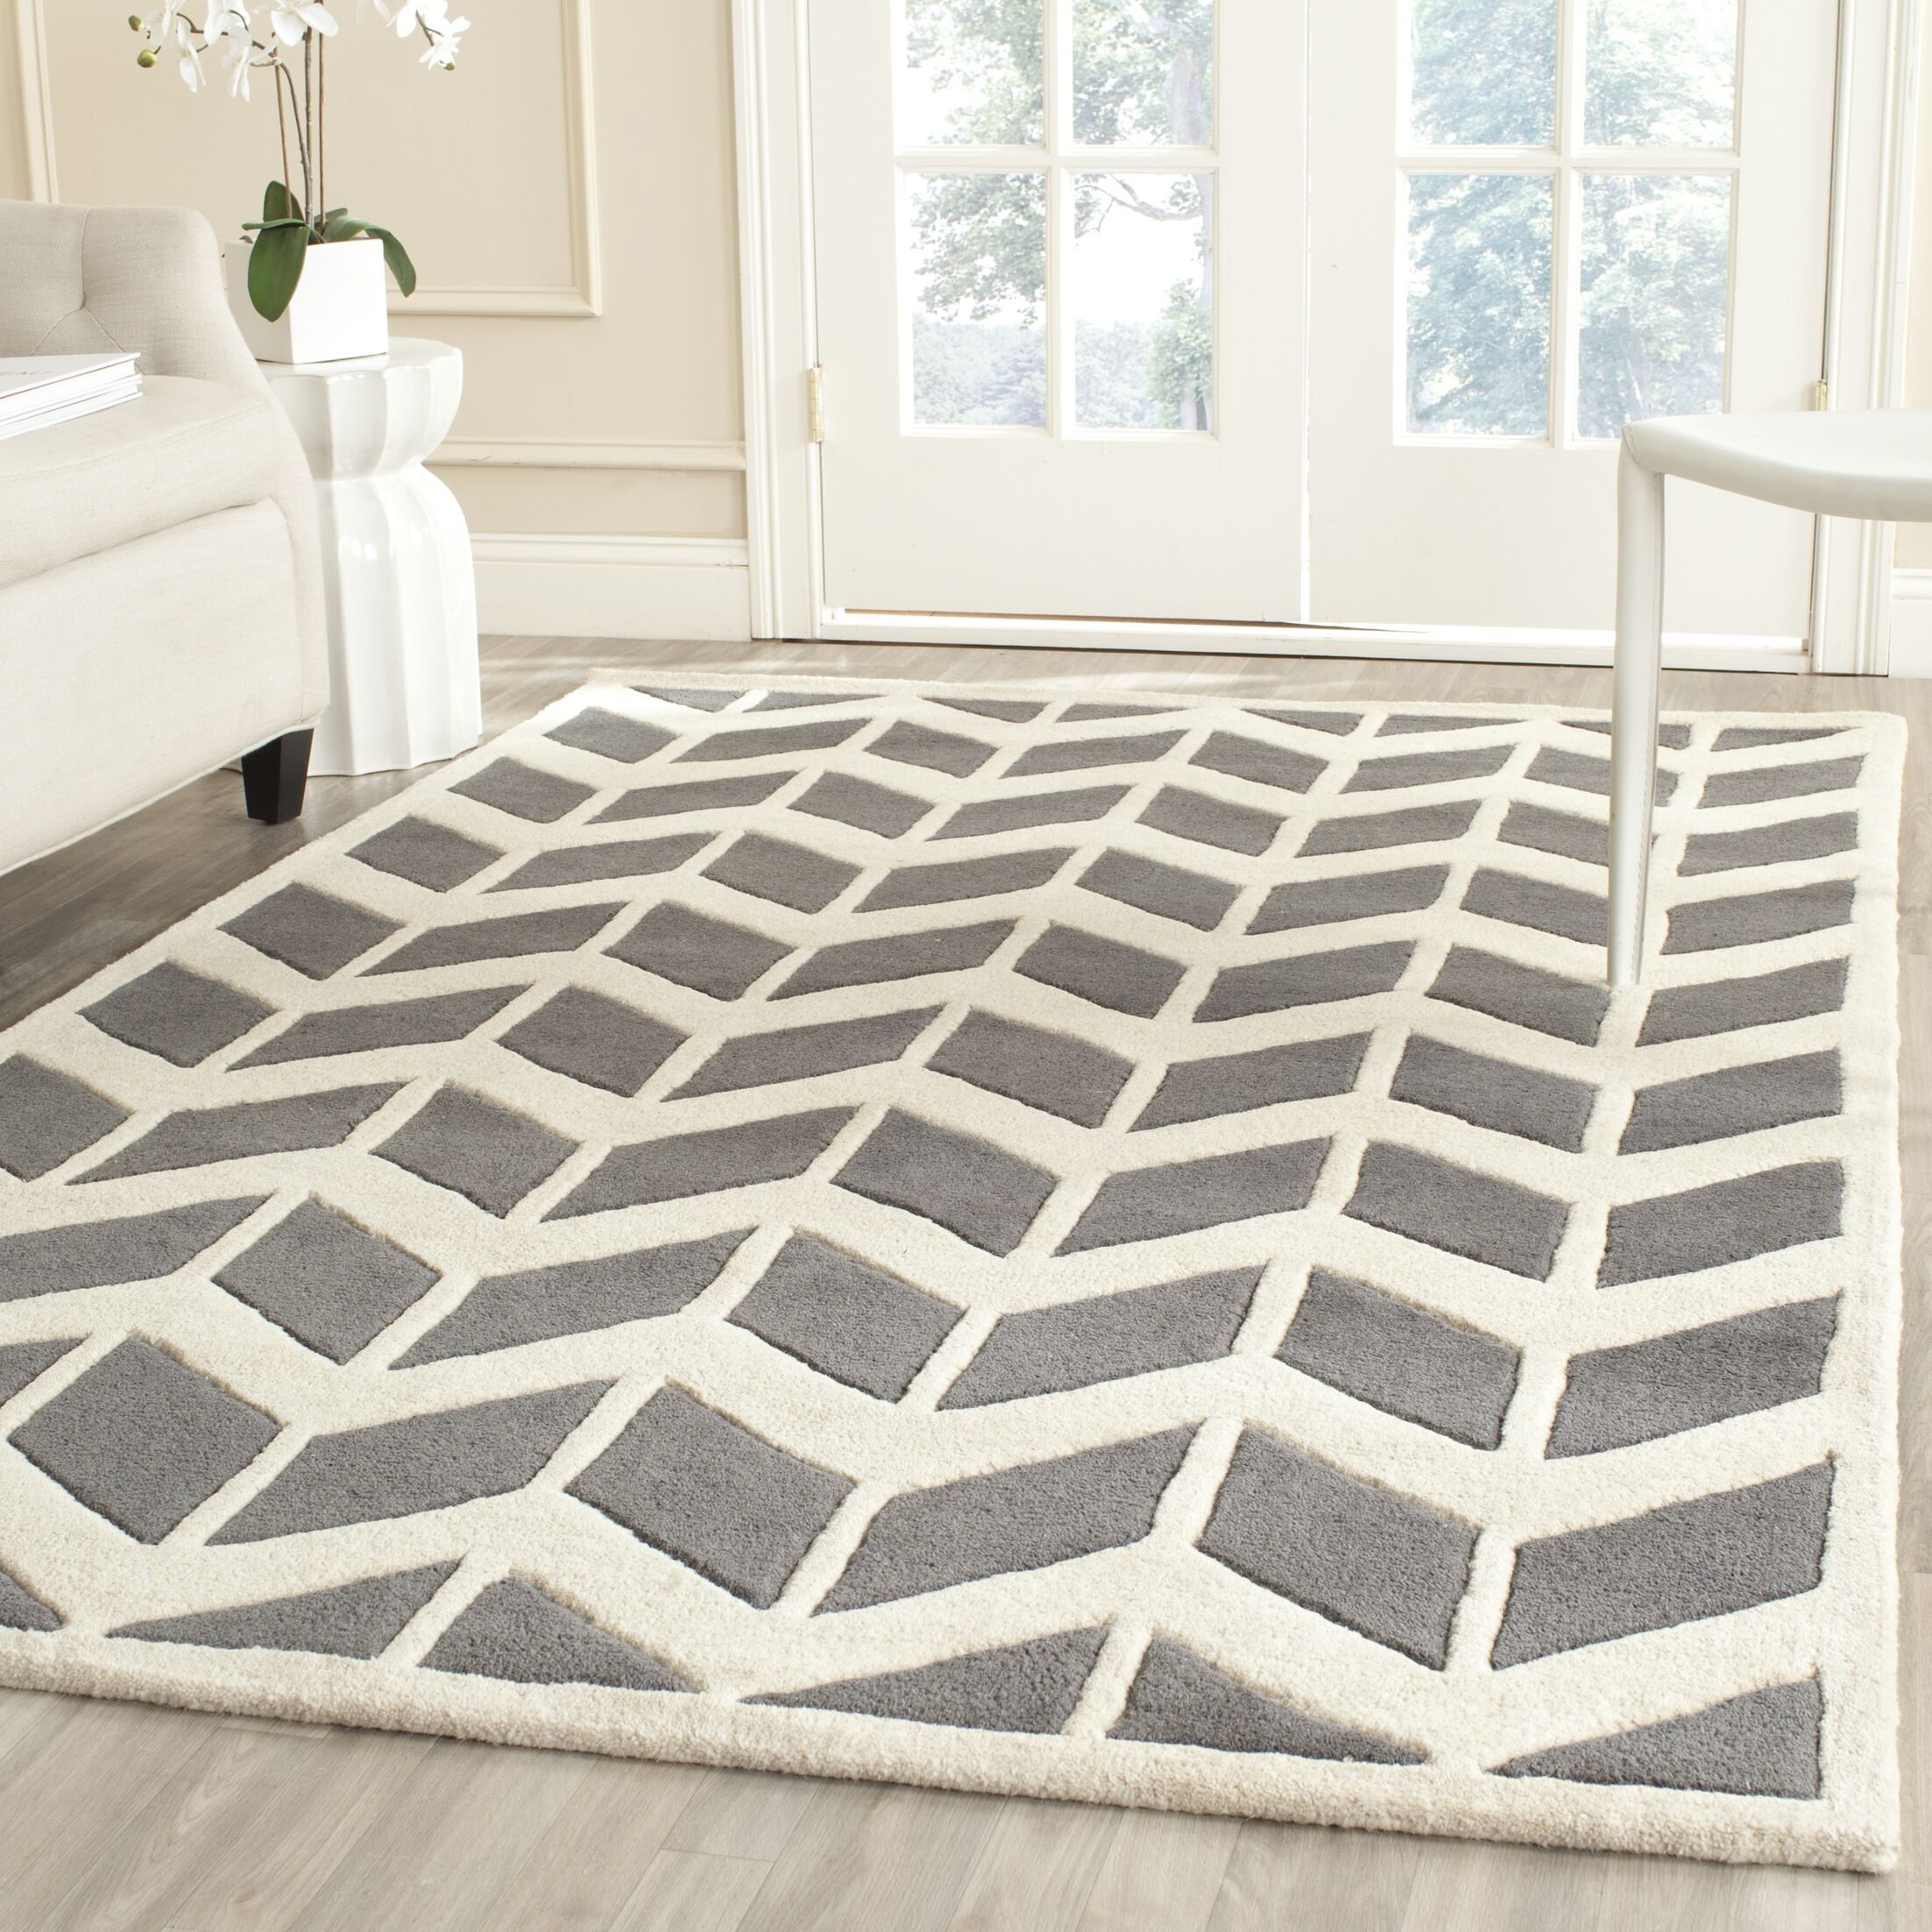 Wilkin Hand-Tufted Wool Dark Gray/Ivory Area Rug Rug Size: Rectangle 4' x 6'